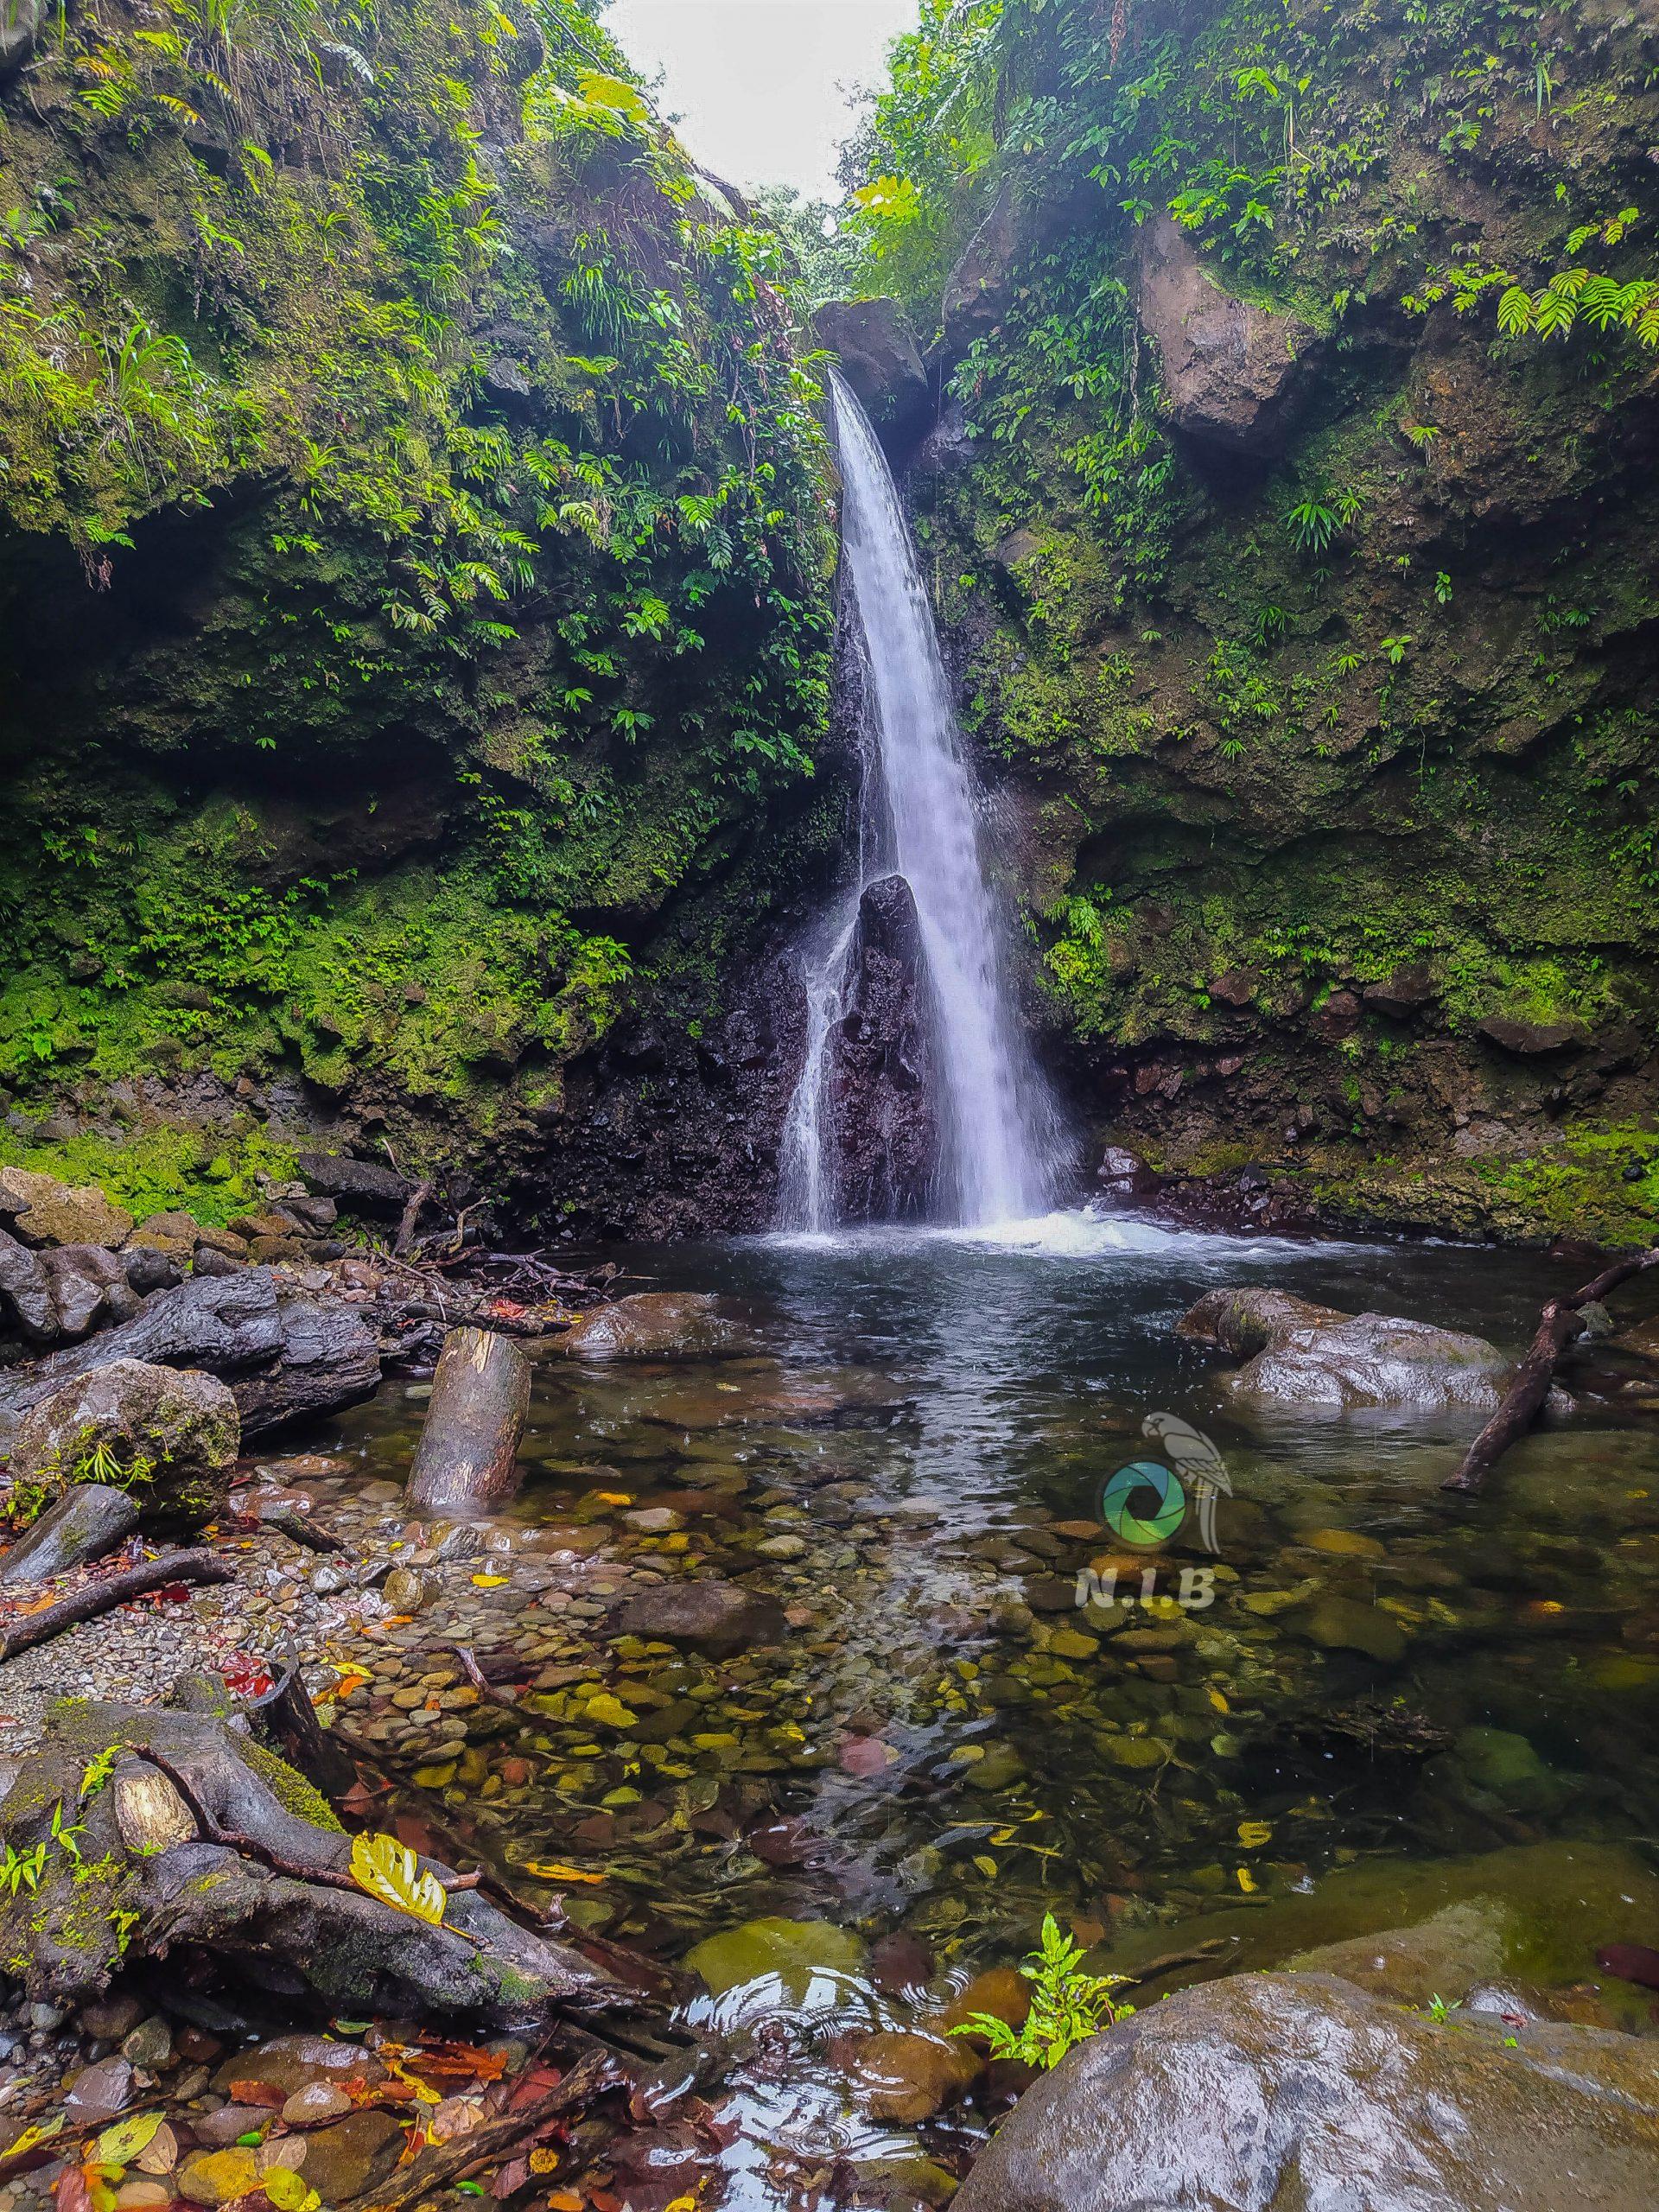 Featured Photo: Jacko Falls – simply beautiful